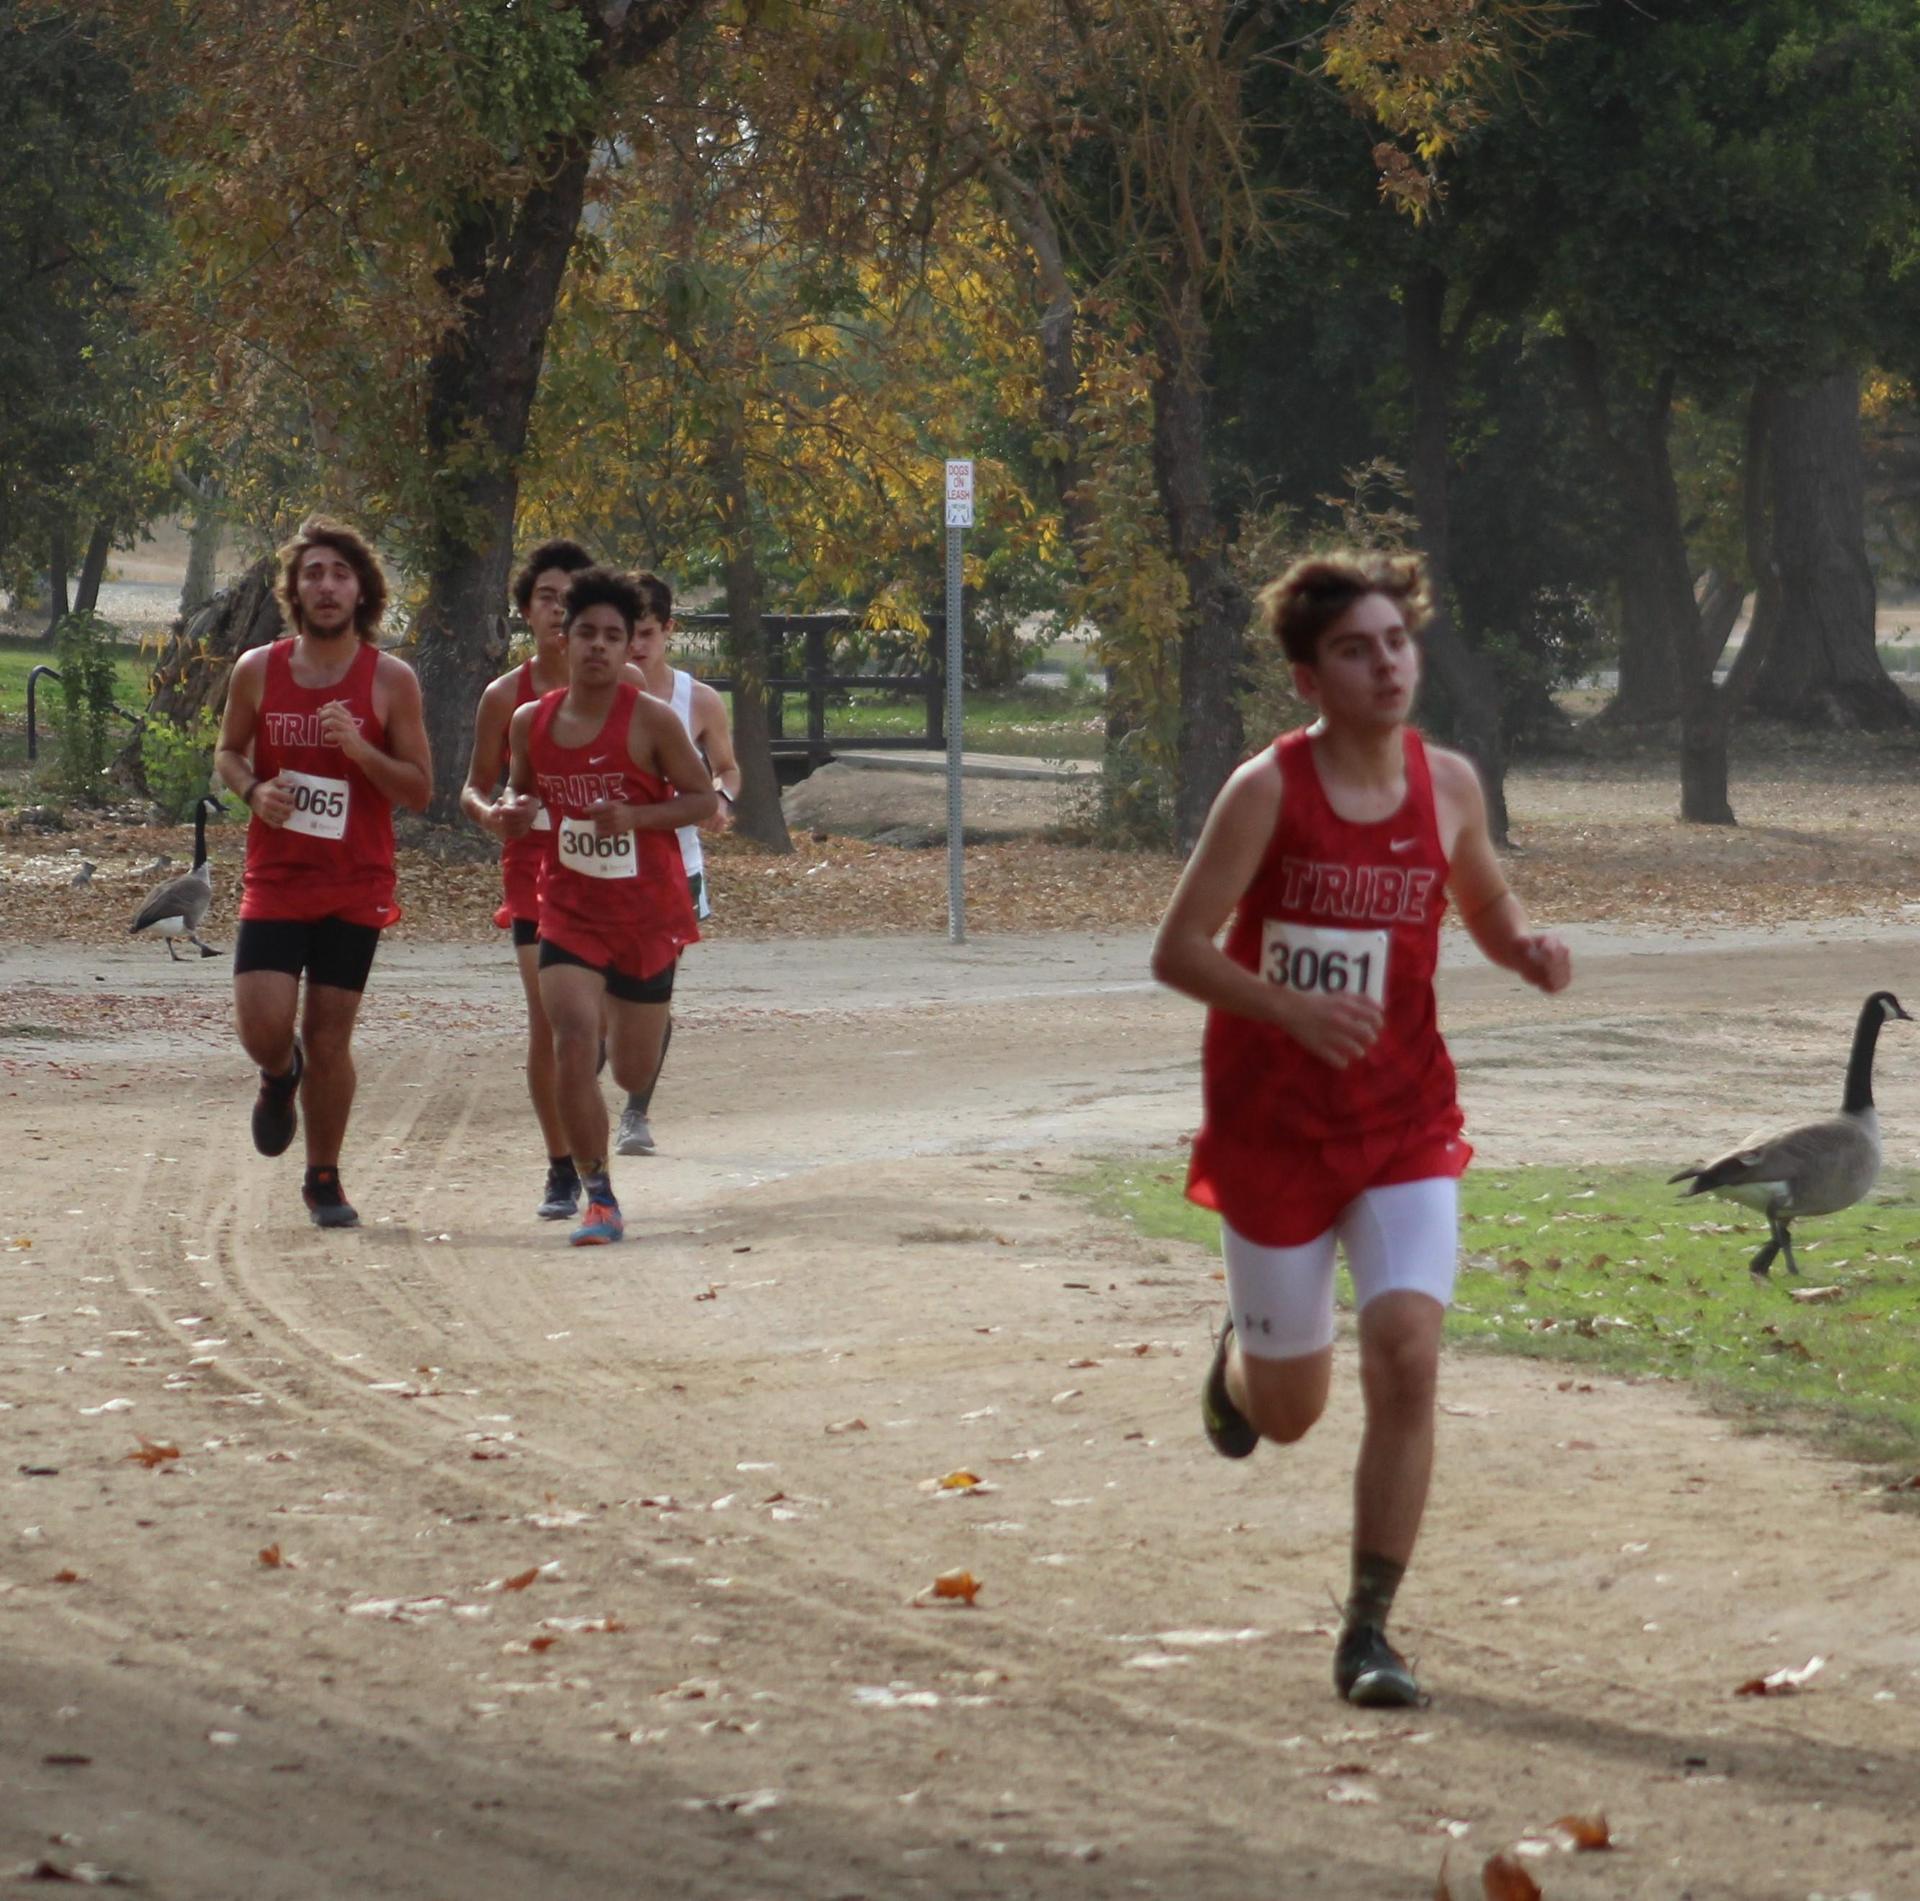 Antonio Brasil, Angel Gonzales, Carson Borba running